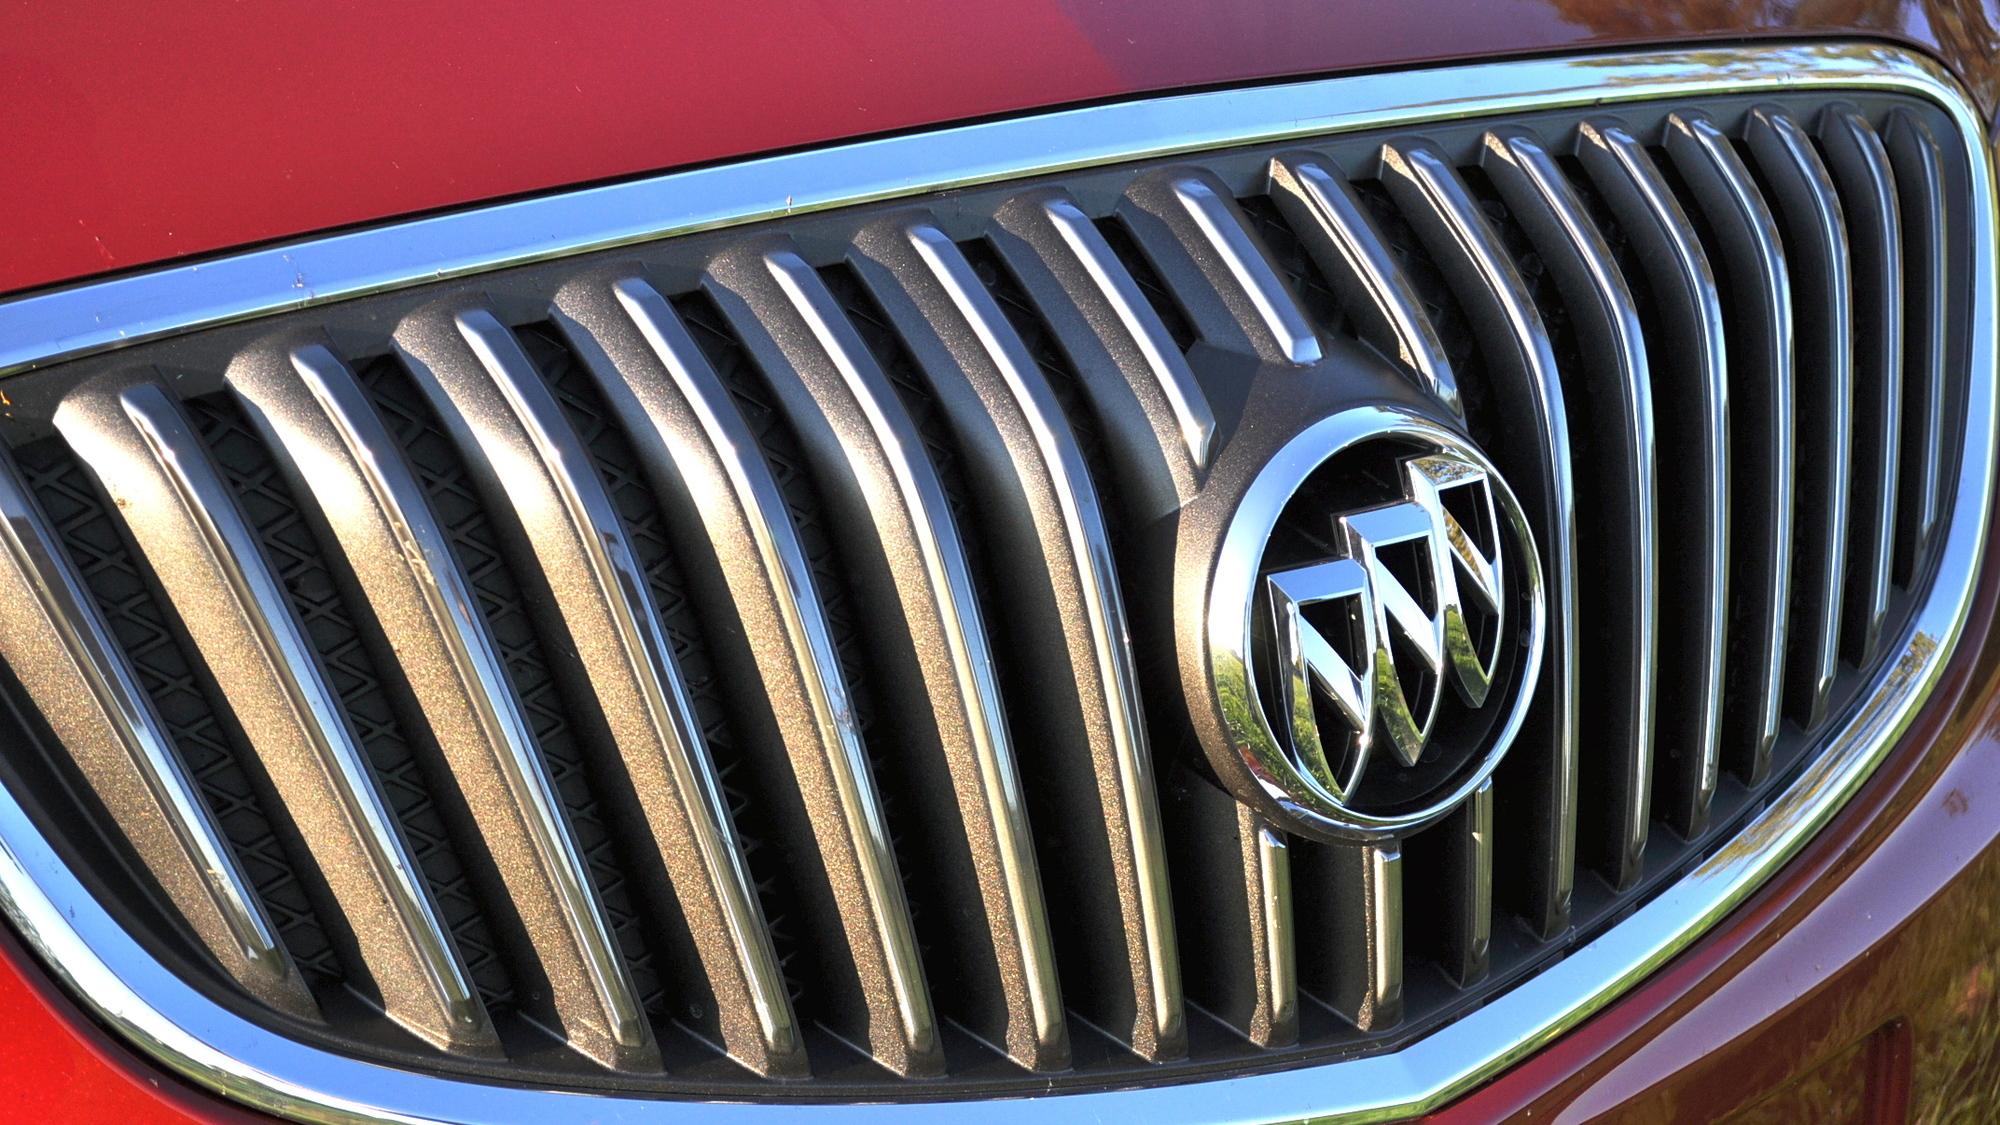 2012 Buick Verano - First Drive